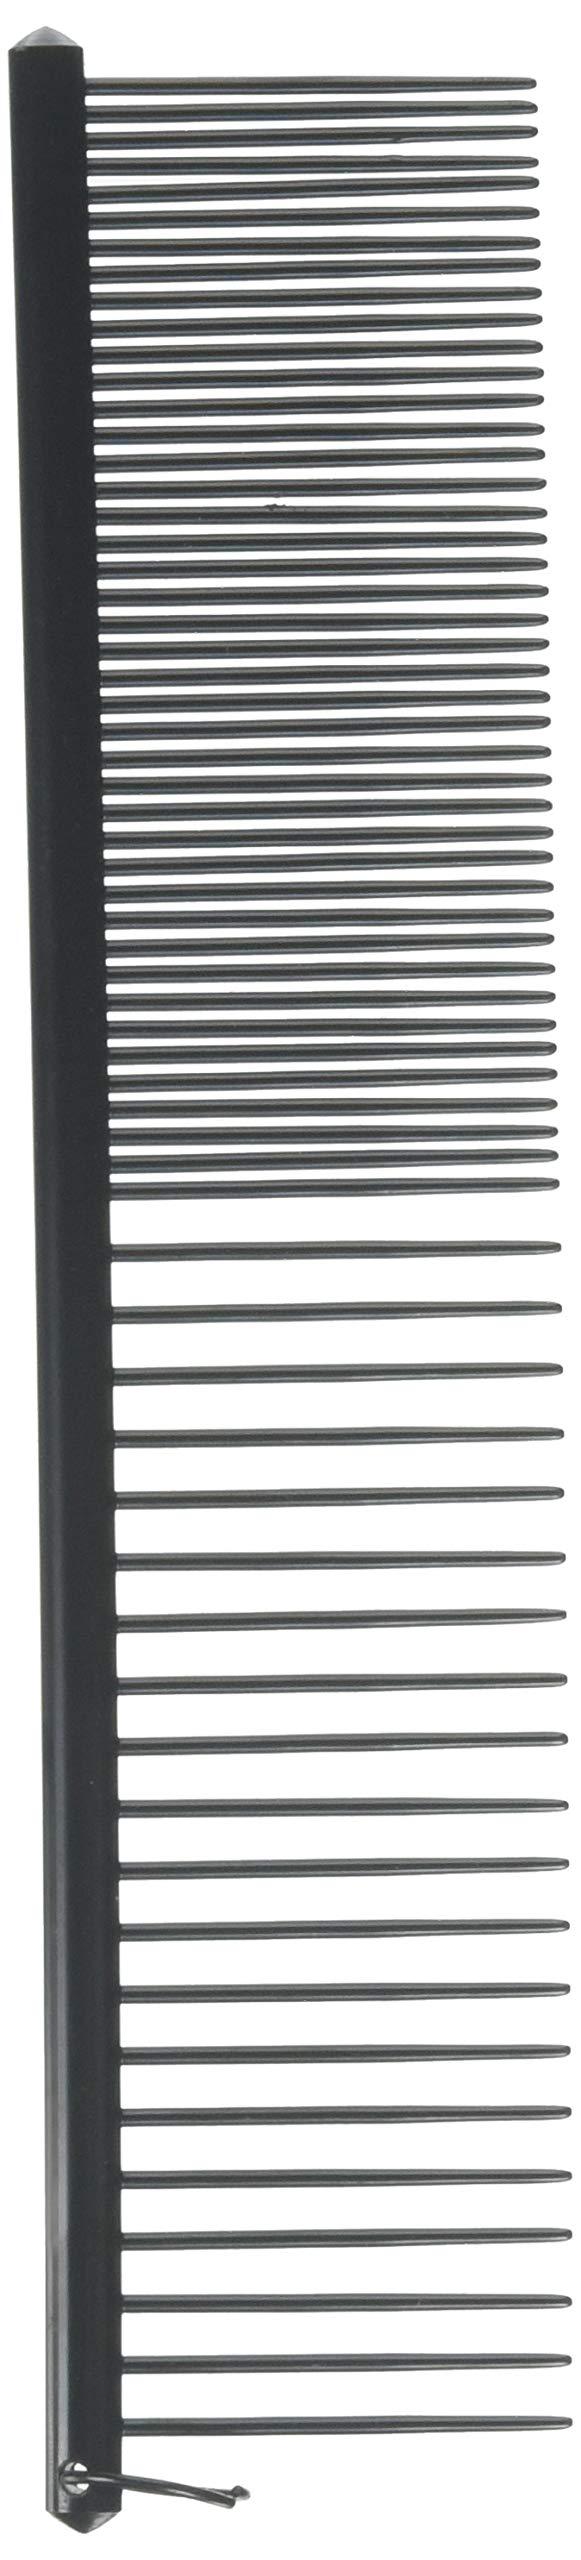 Millers Forge Deluxe Flea Comb